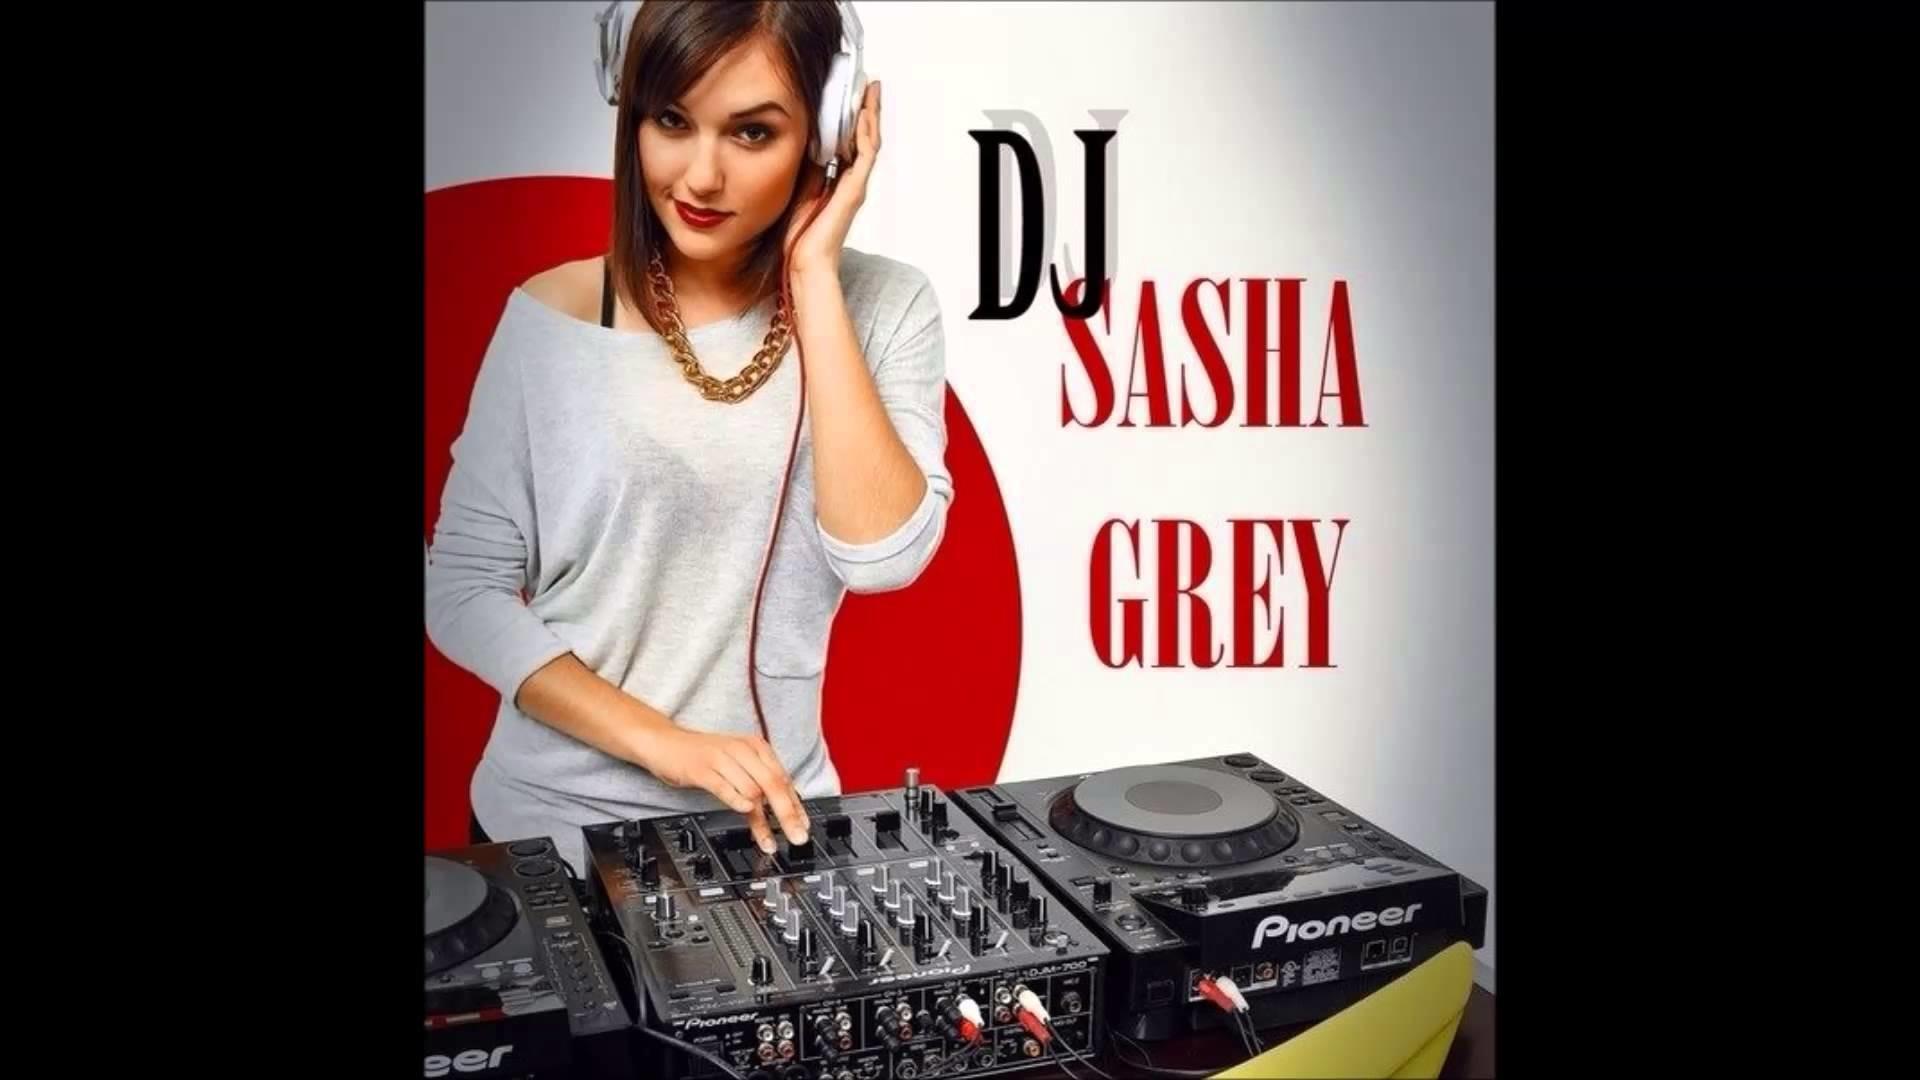 DJ Sasha Gray – Archangel